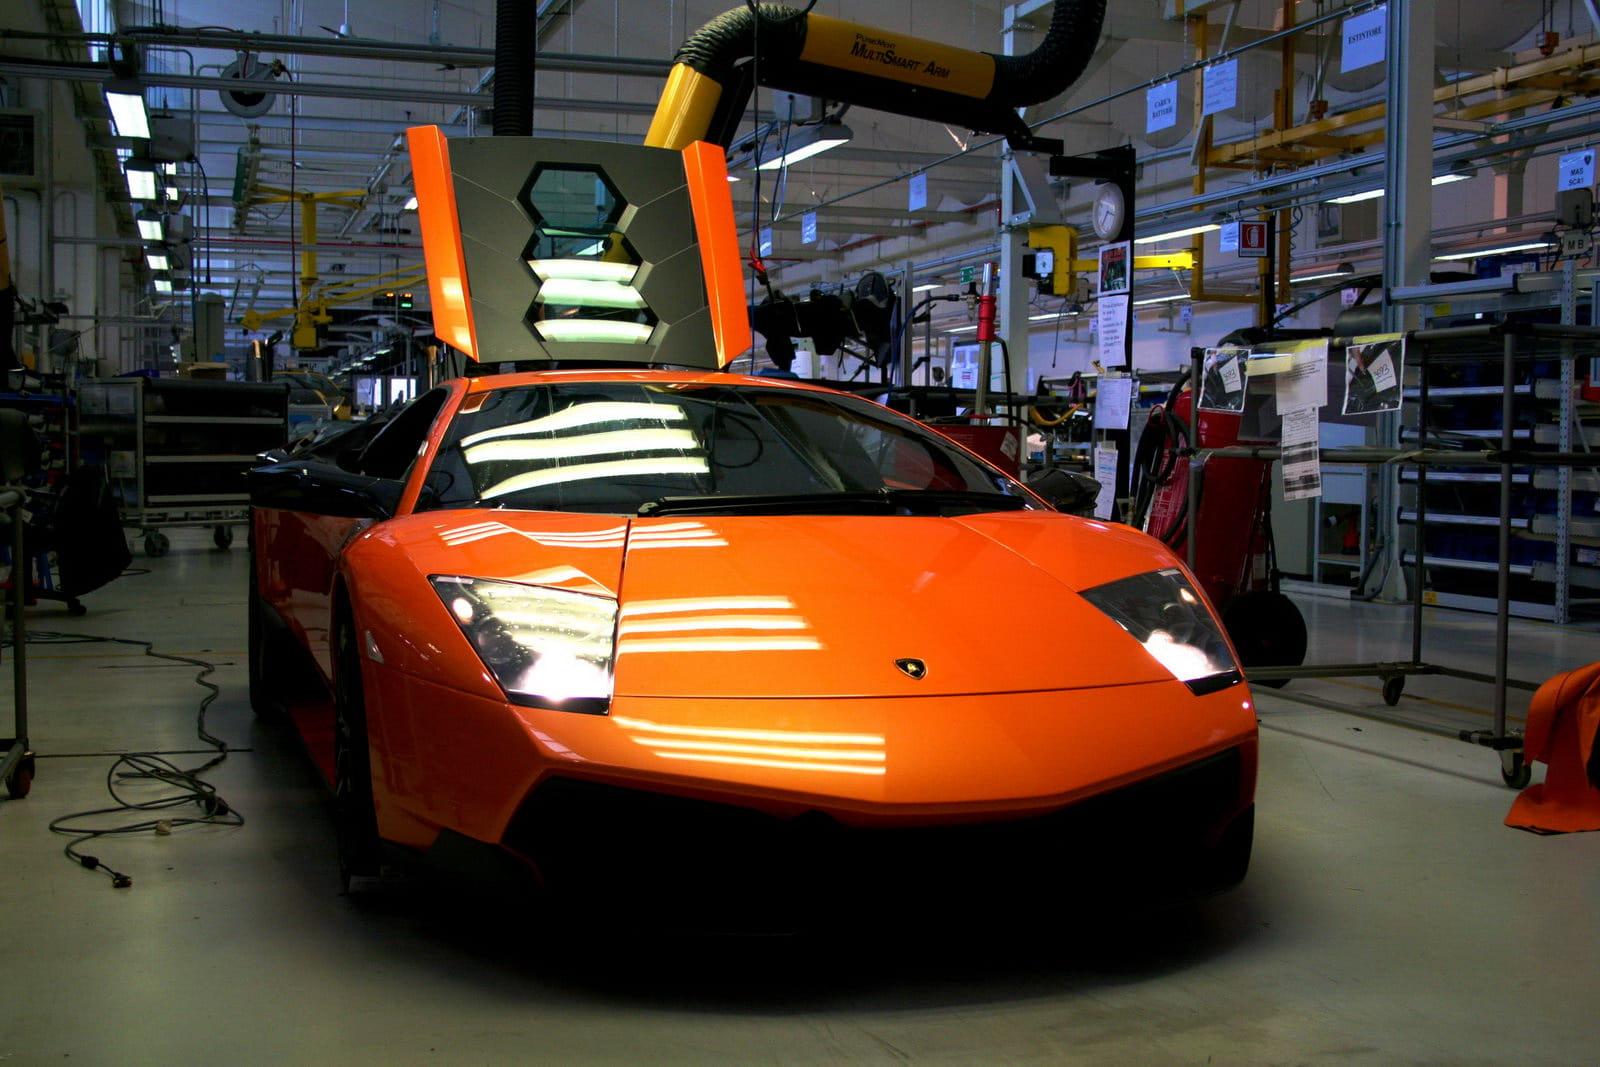 Video Del Proceso De Construccion Del Lamborghini Murcielago Lp670 4 Sv Diariomotor